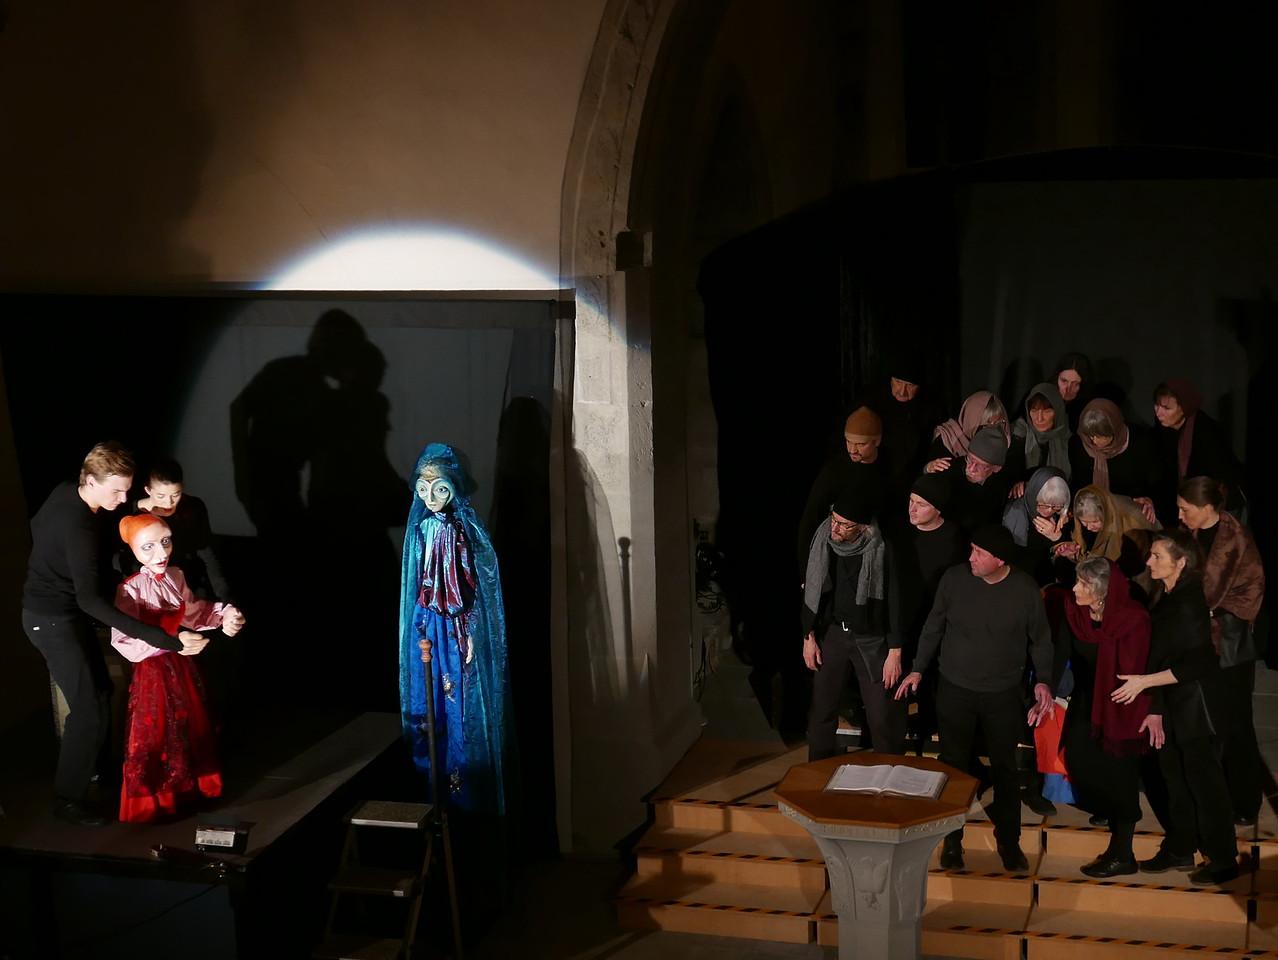 @ 28.03.18, 20:47 / kath. Kirche Veltheim-Winterthur